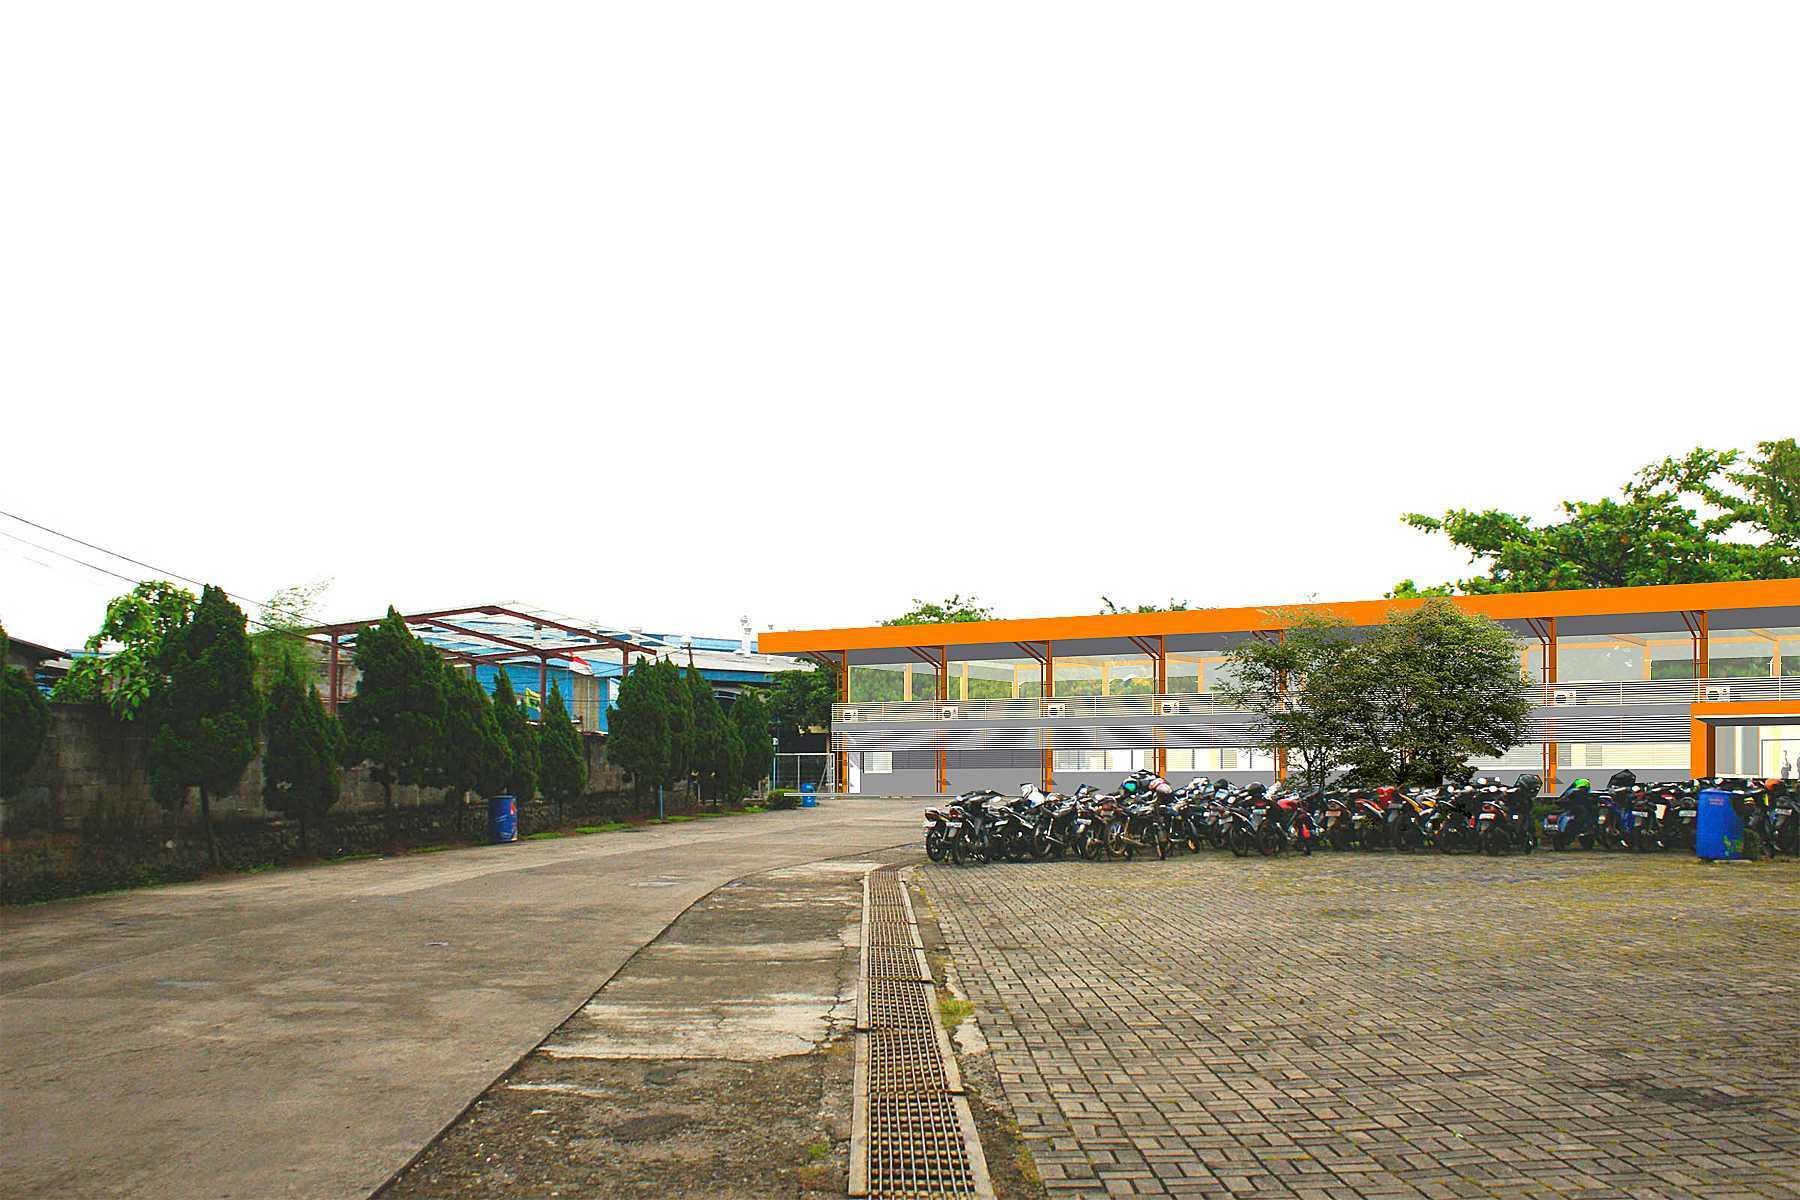 Pt.  Atelier Una Indonesia Cometa Office  Bitung, Kota Bitung, Sulawesi Utara, Indonesia Bitung, Kota Bitung, Sulawesi Utara, Indonesia Pt-Atelier-Una-Indonesia-Cometa-Office-  57926